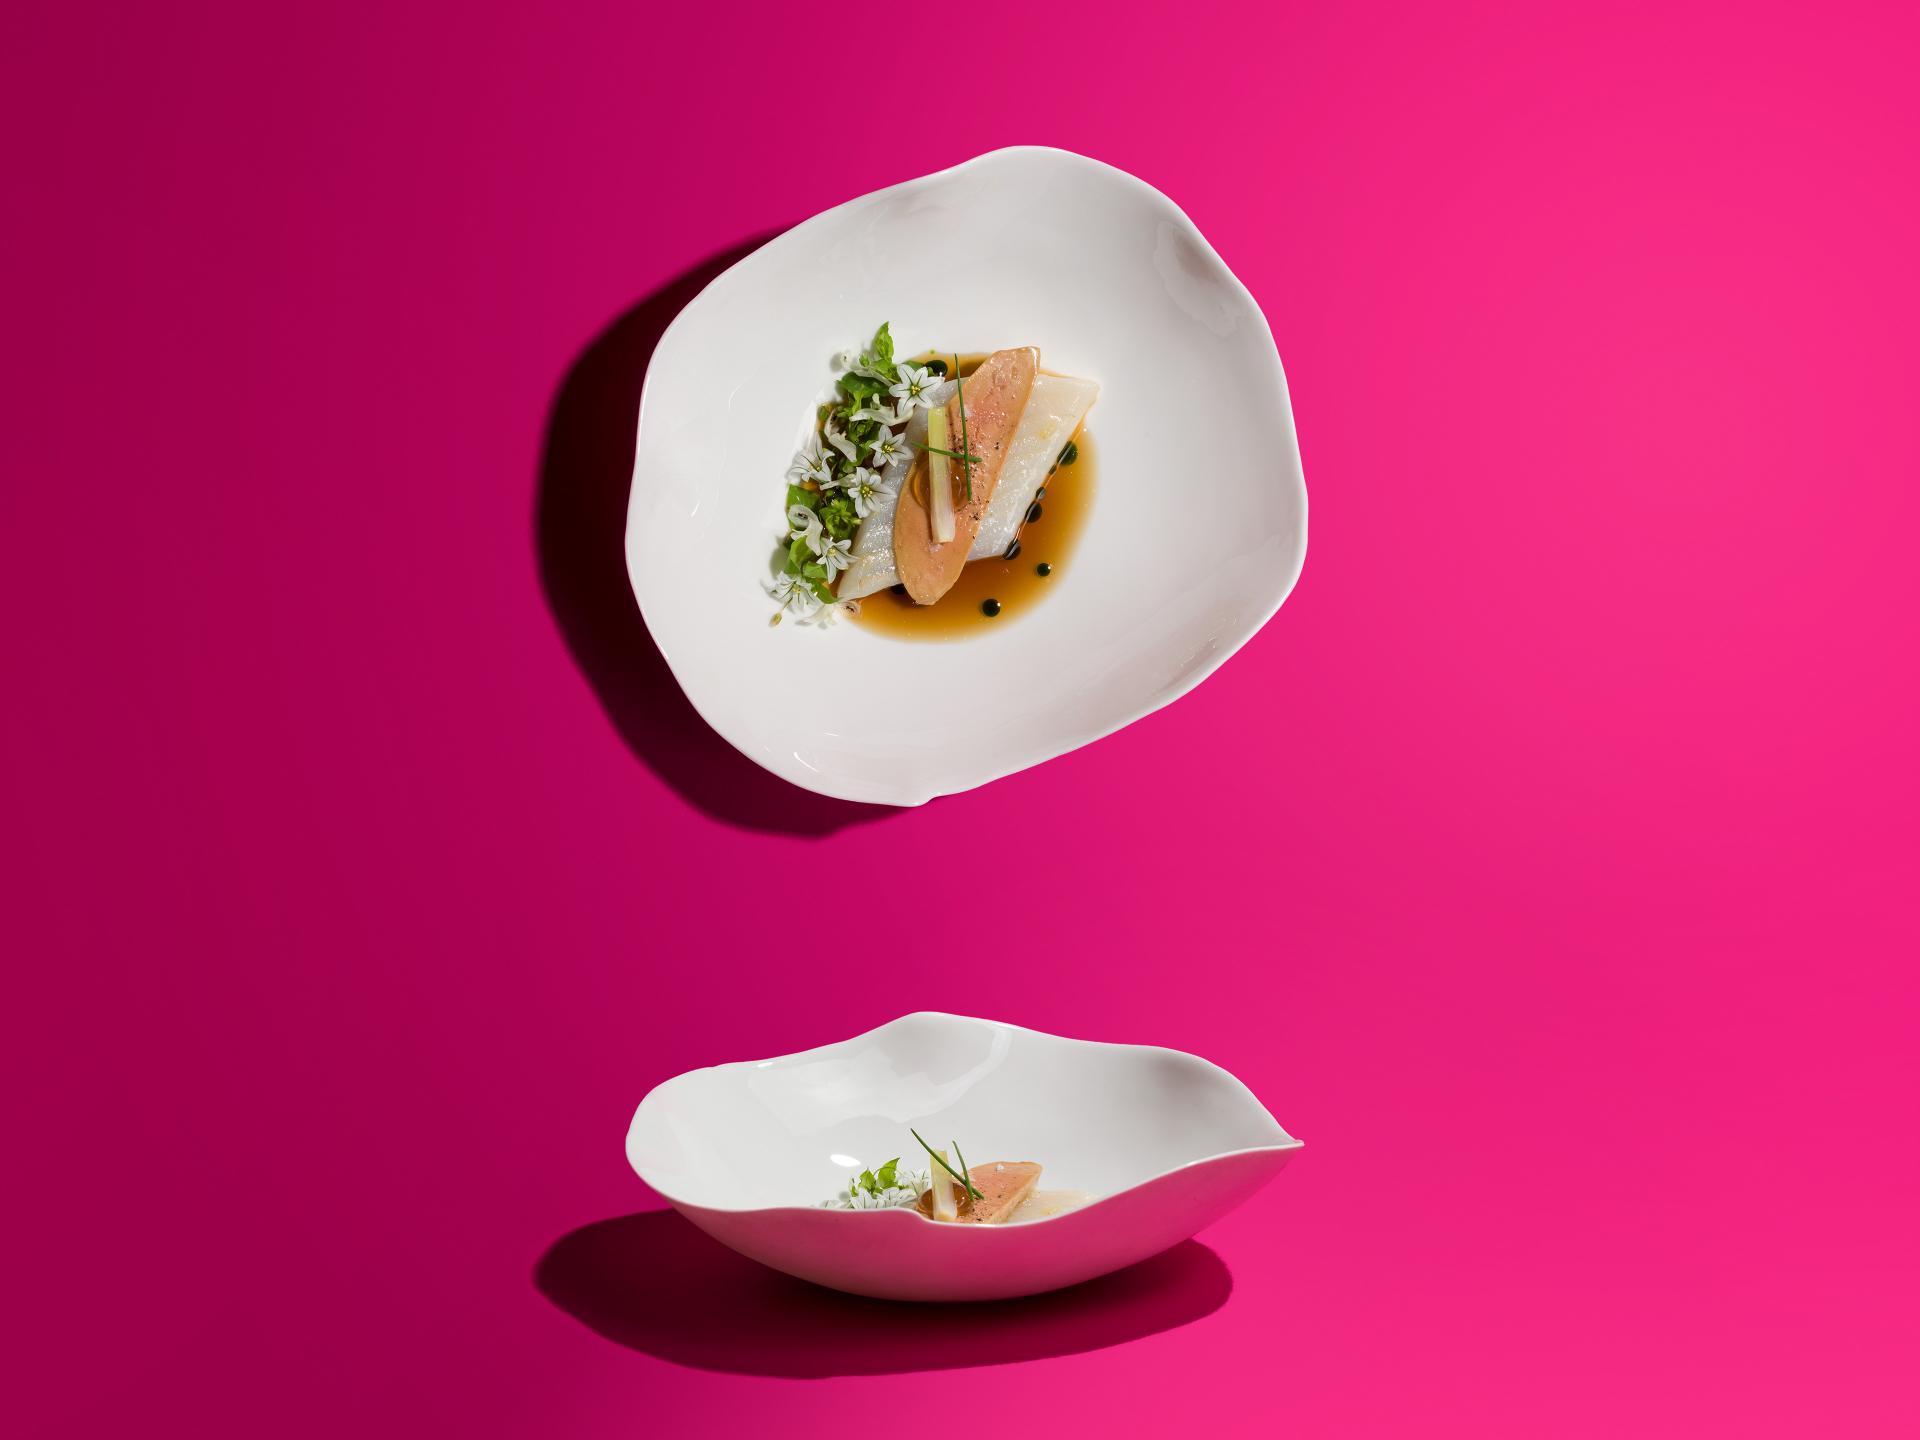 James Knappett, Kitchen Table, Turbot foie gras, onion